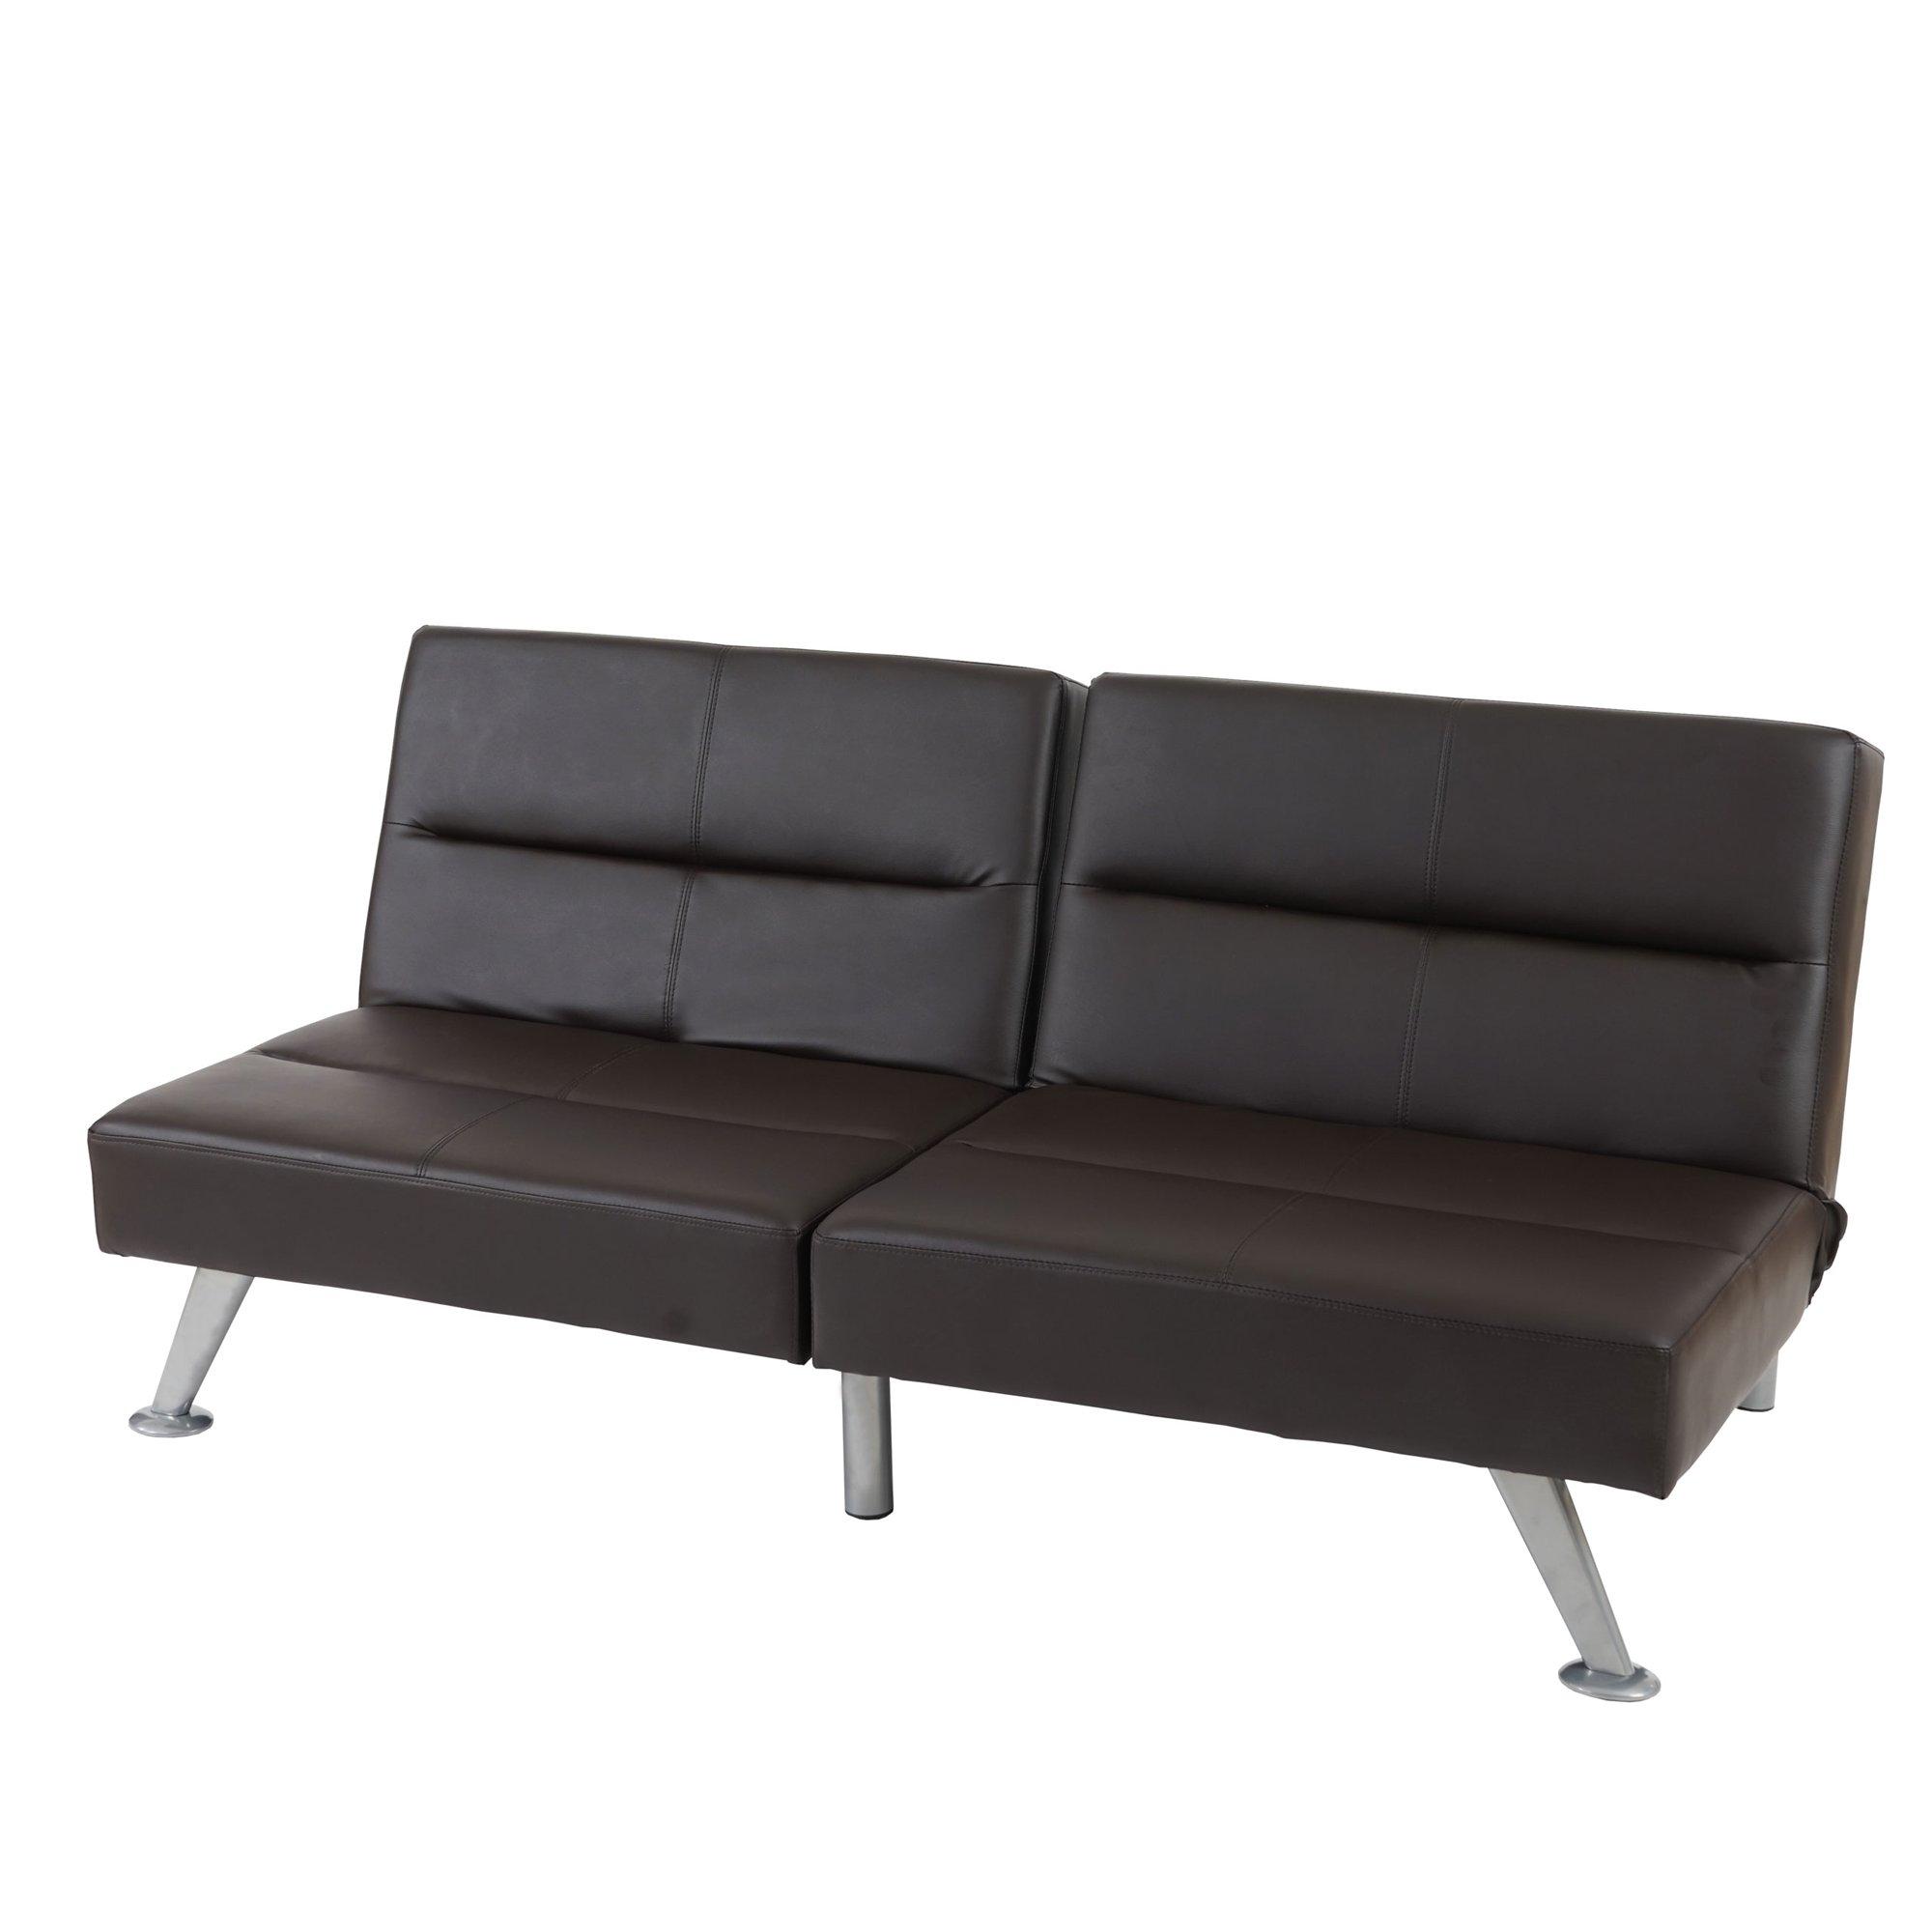 Sof de 3 plazas sof cama cama darwin ii marr n for Sofa cama de cuero